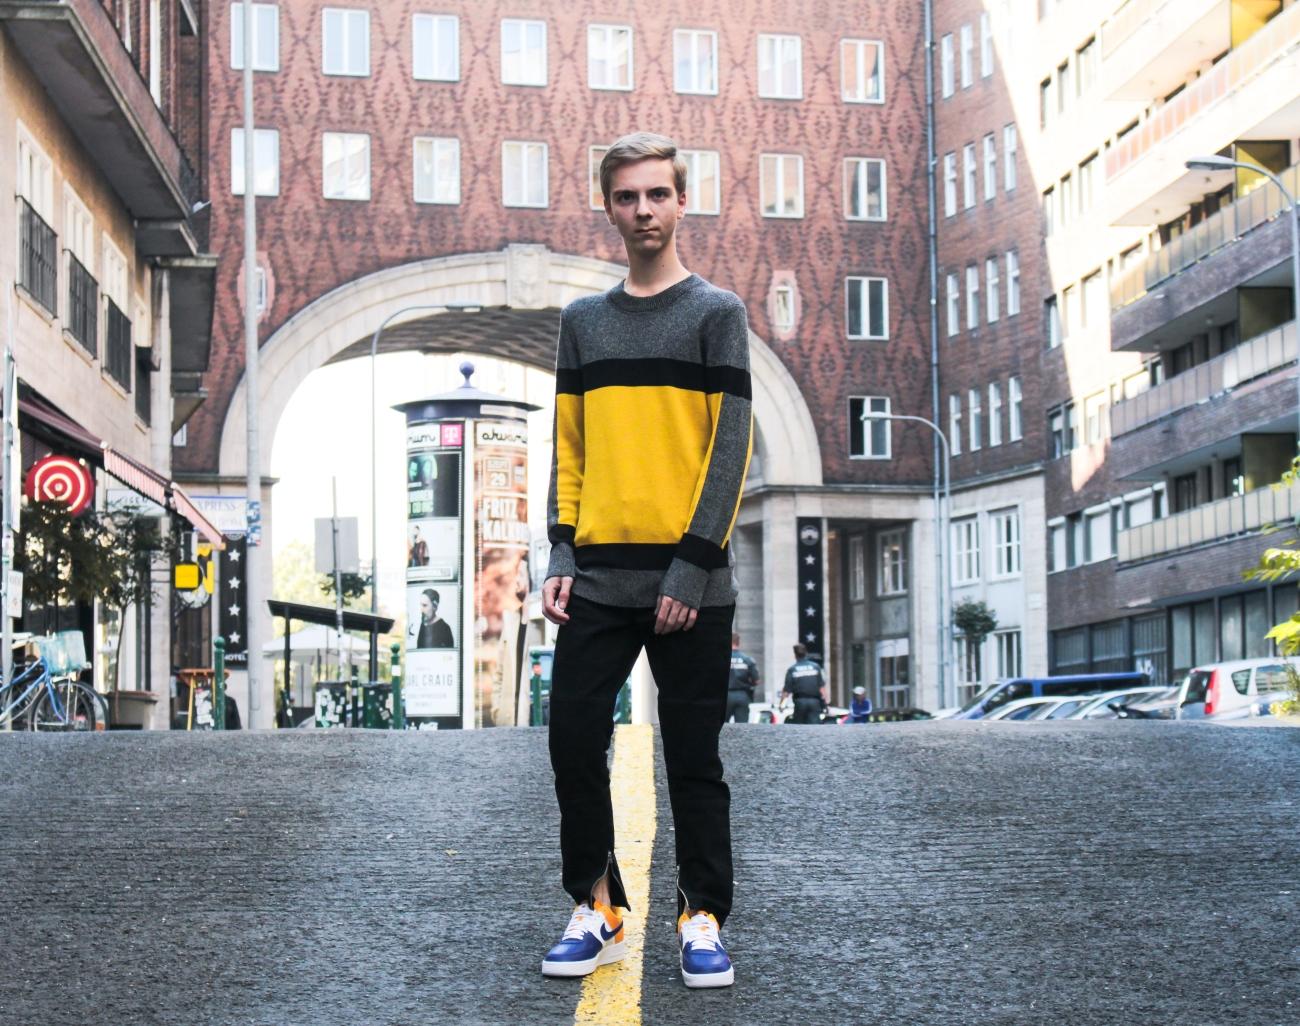 balazs-zsalek-90-yellow-and-grey-vibes.3